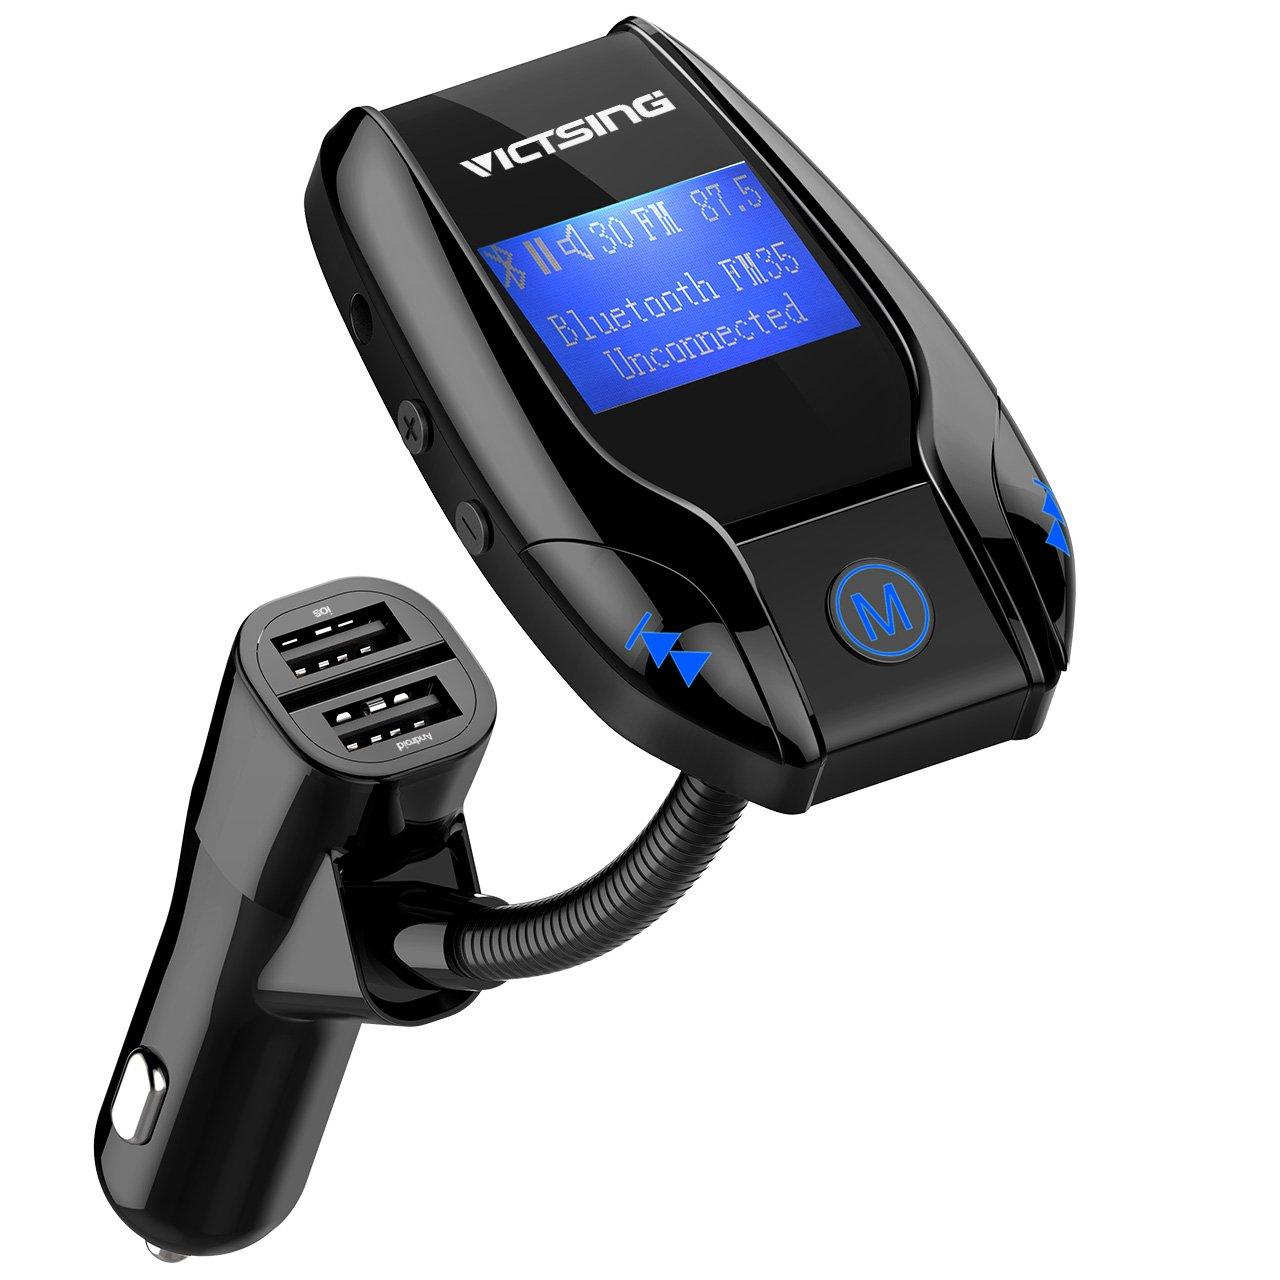 VicTsing Manos Libres Bluetooth Coche Kit Radio Receptor Transmisor FM Bluetooth para